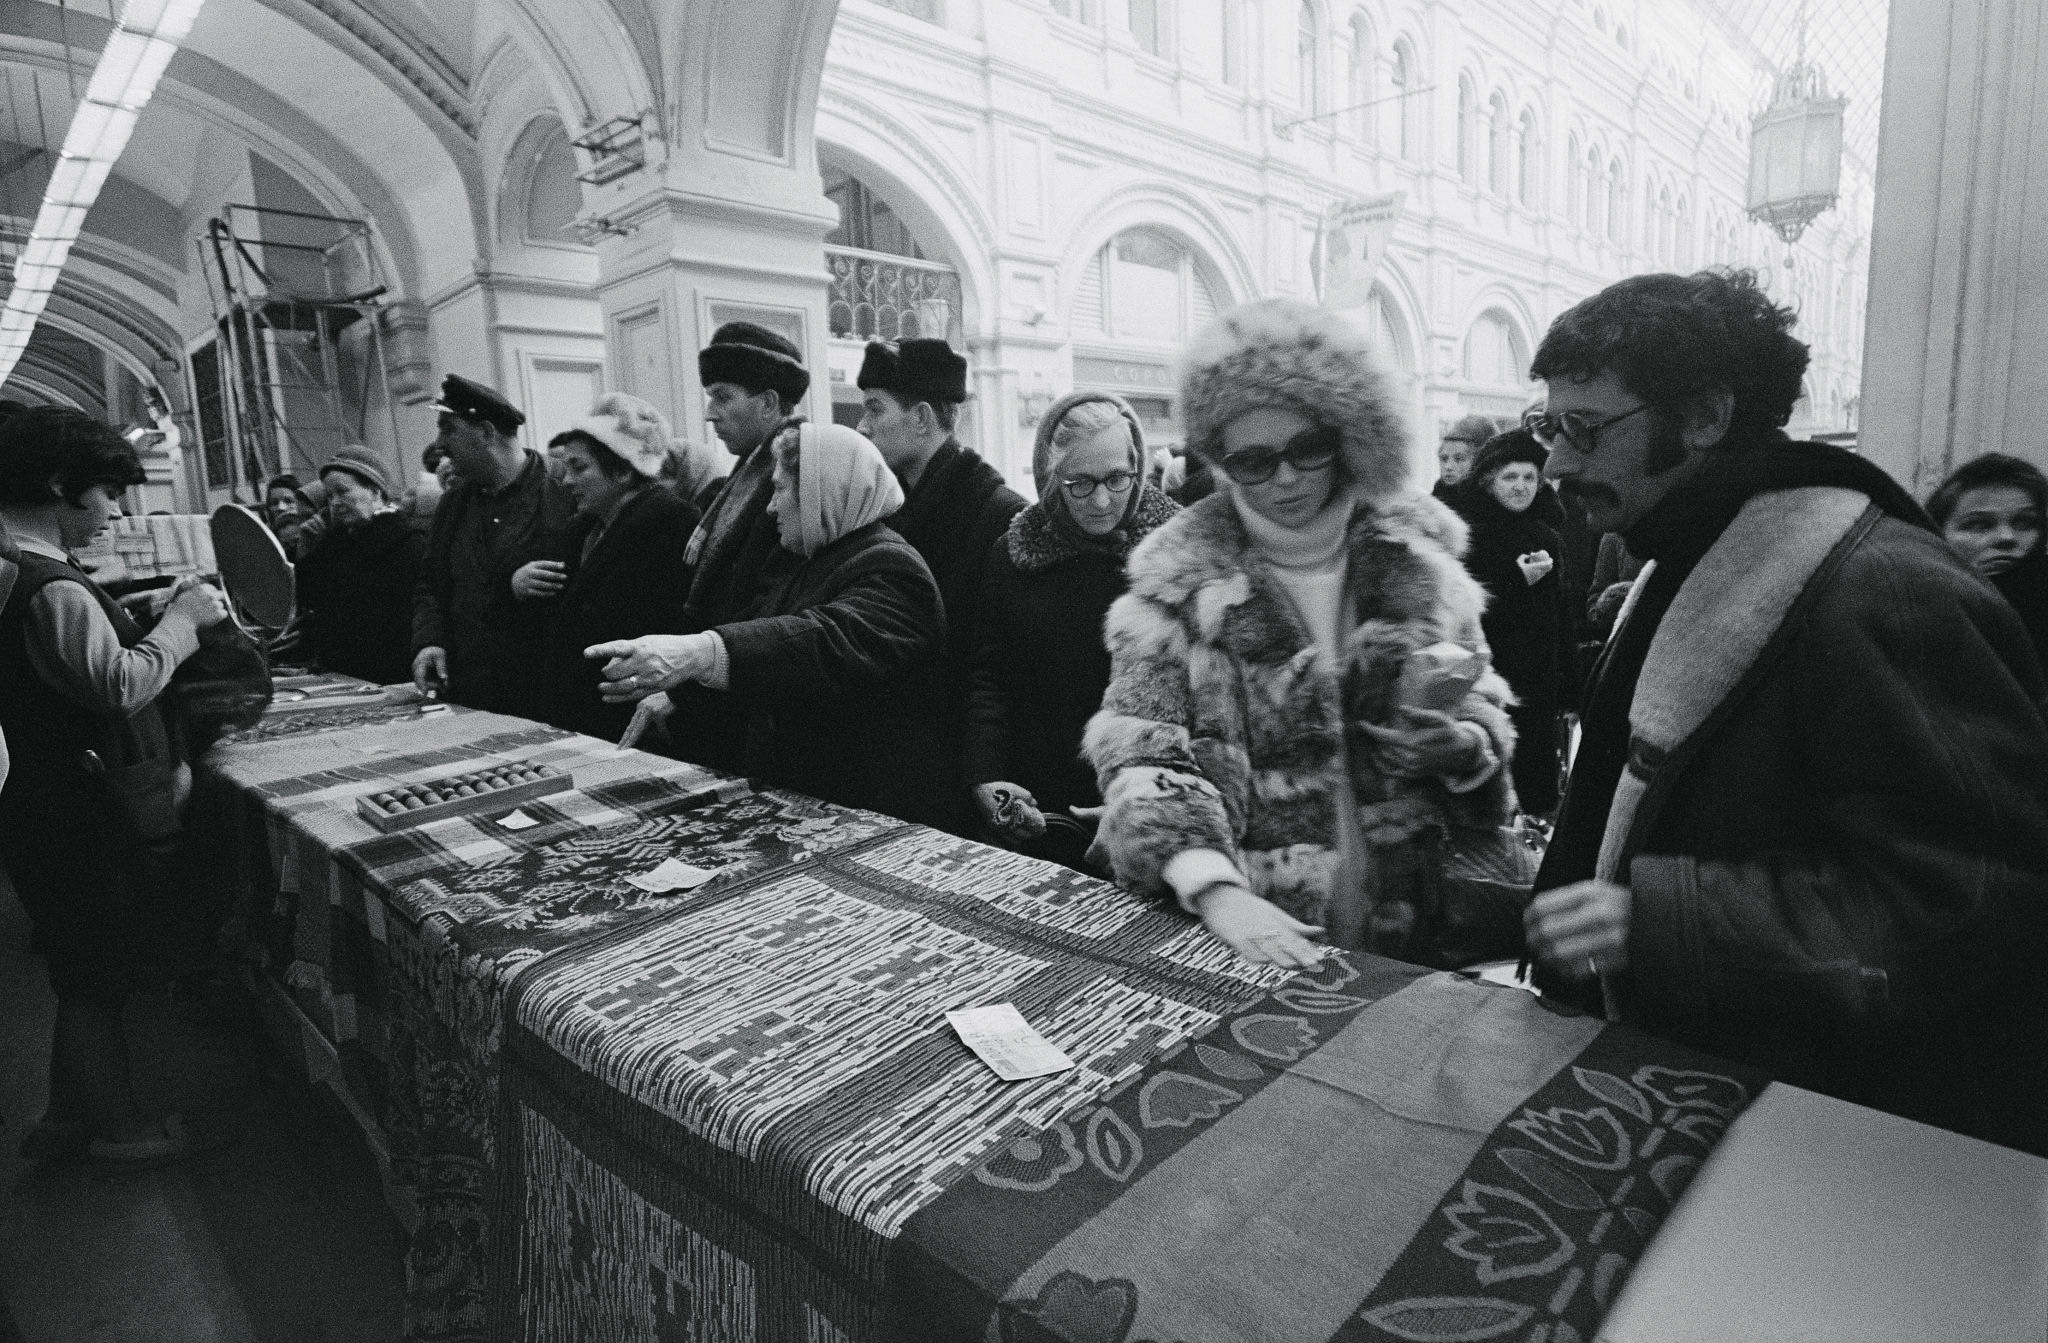 1968. Фэй Данауэй и Джерри Шацберг в ГУМе.jpg